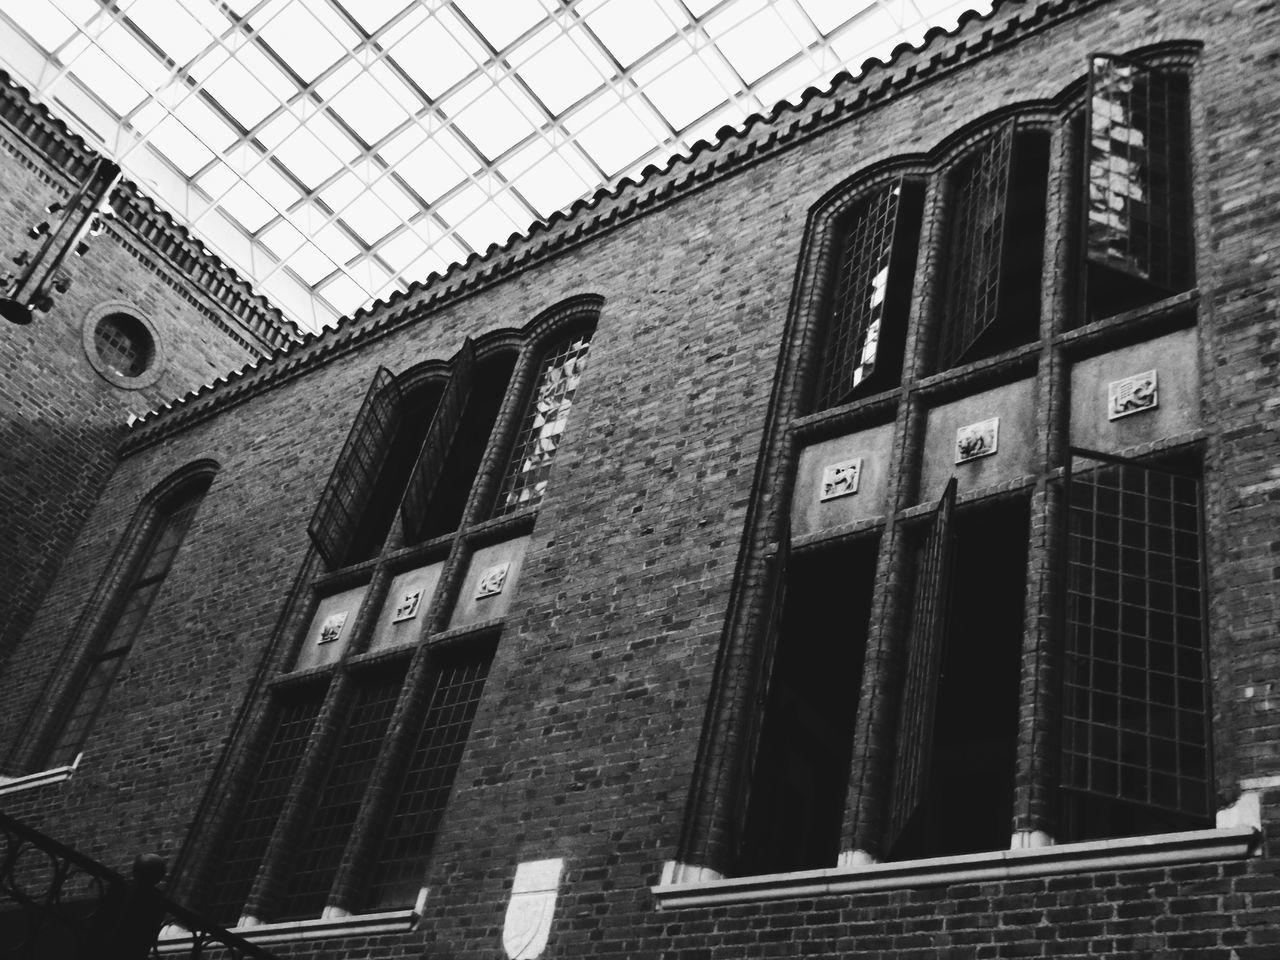 Black And White Photography Black And White Windows Shiny Windows Reflecting Light Gothic Victorian Elegant Touring Detroit Dia Interior Views Things I Like The Architect - 2016 EyeEm Awards Fine Art Photography Welcome To Black BYOPaper!